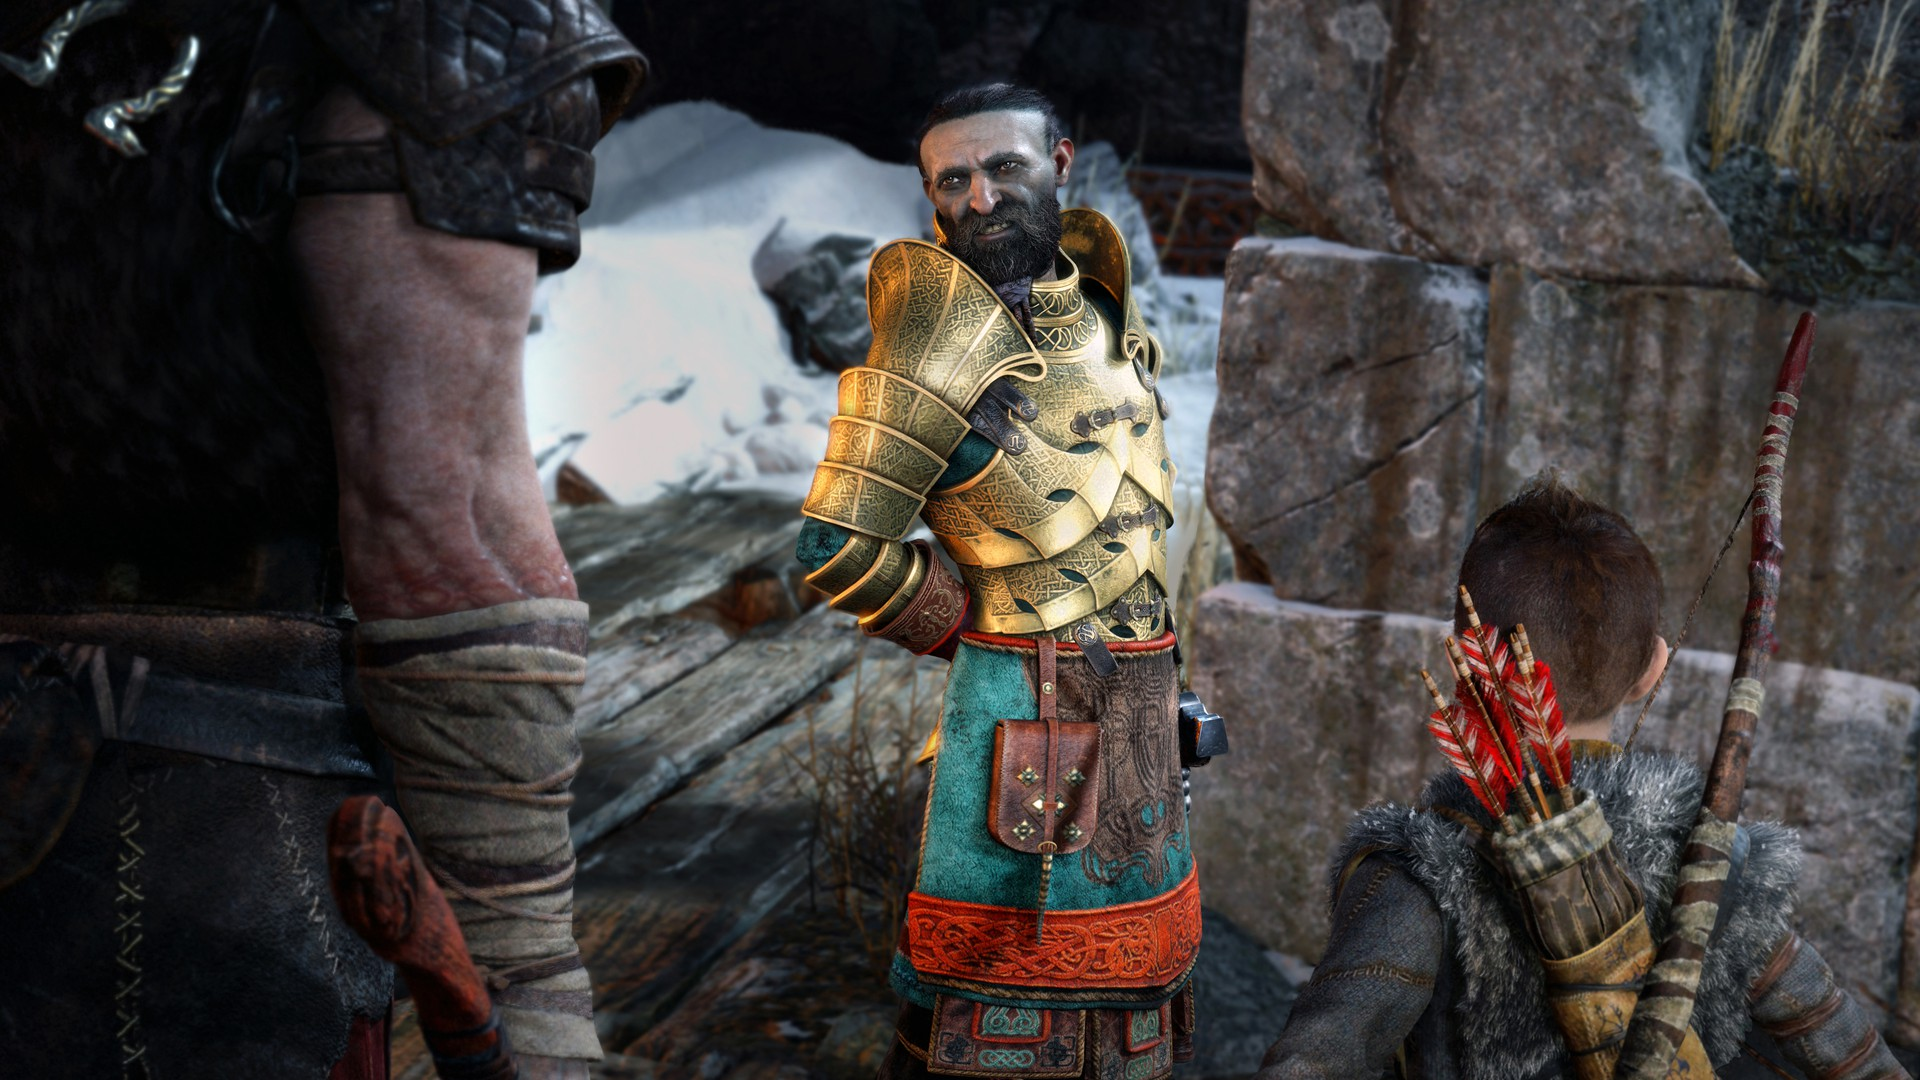 test-god-of-war-kratos-sindri-nain